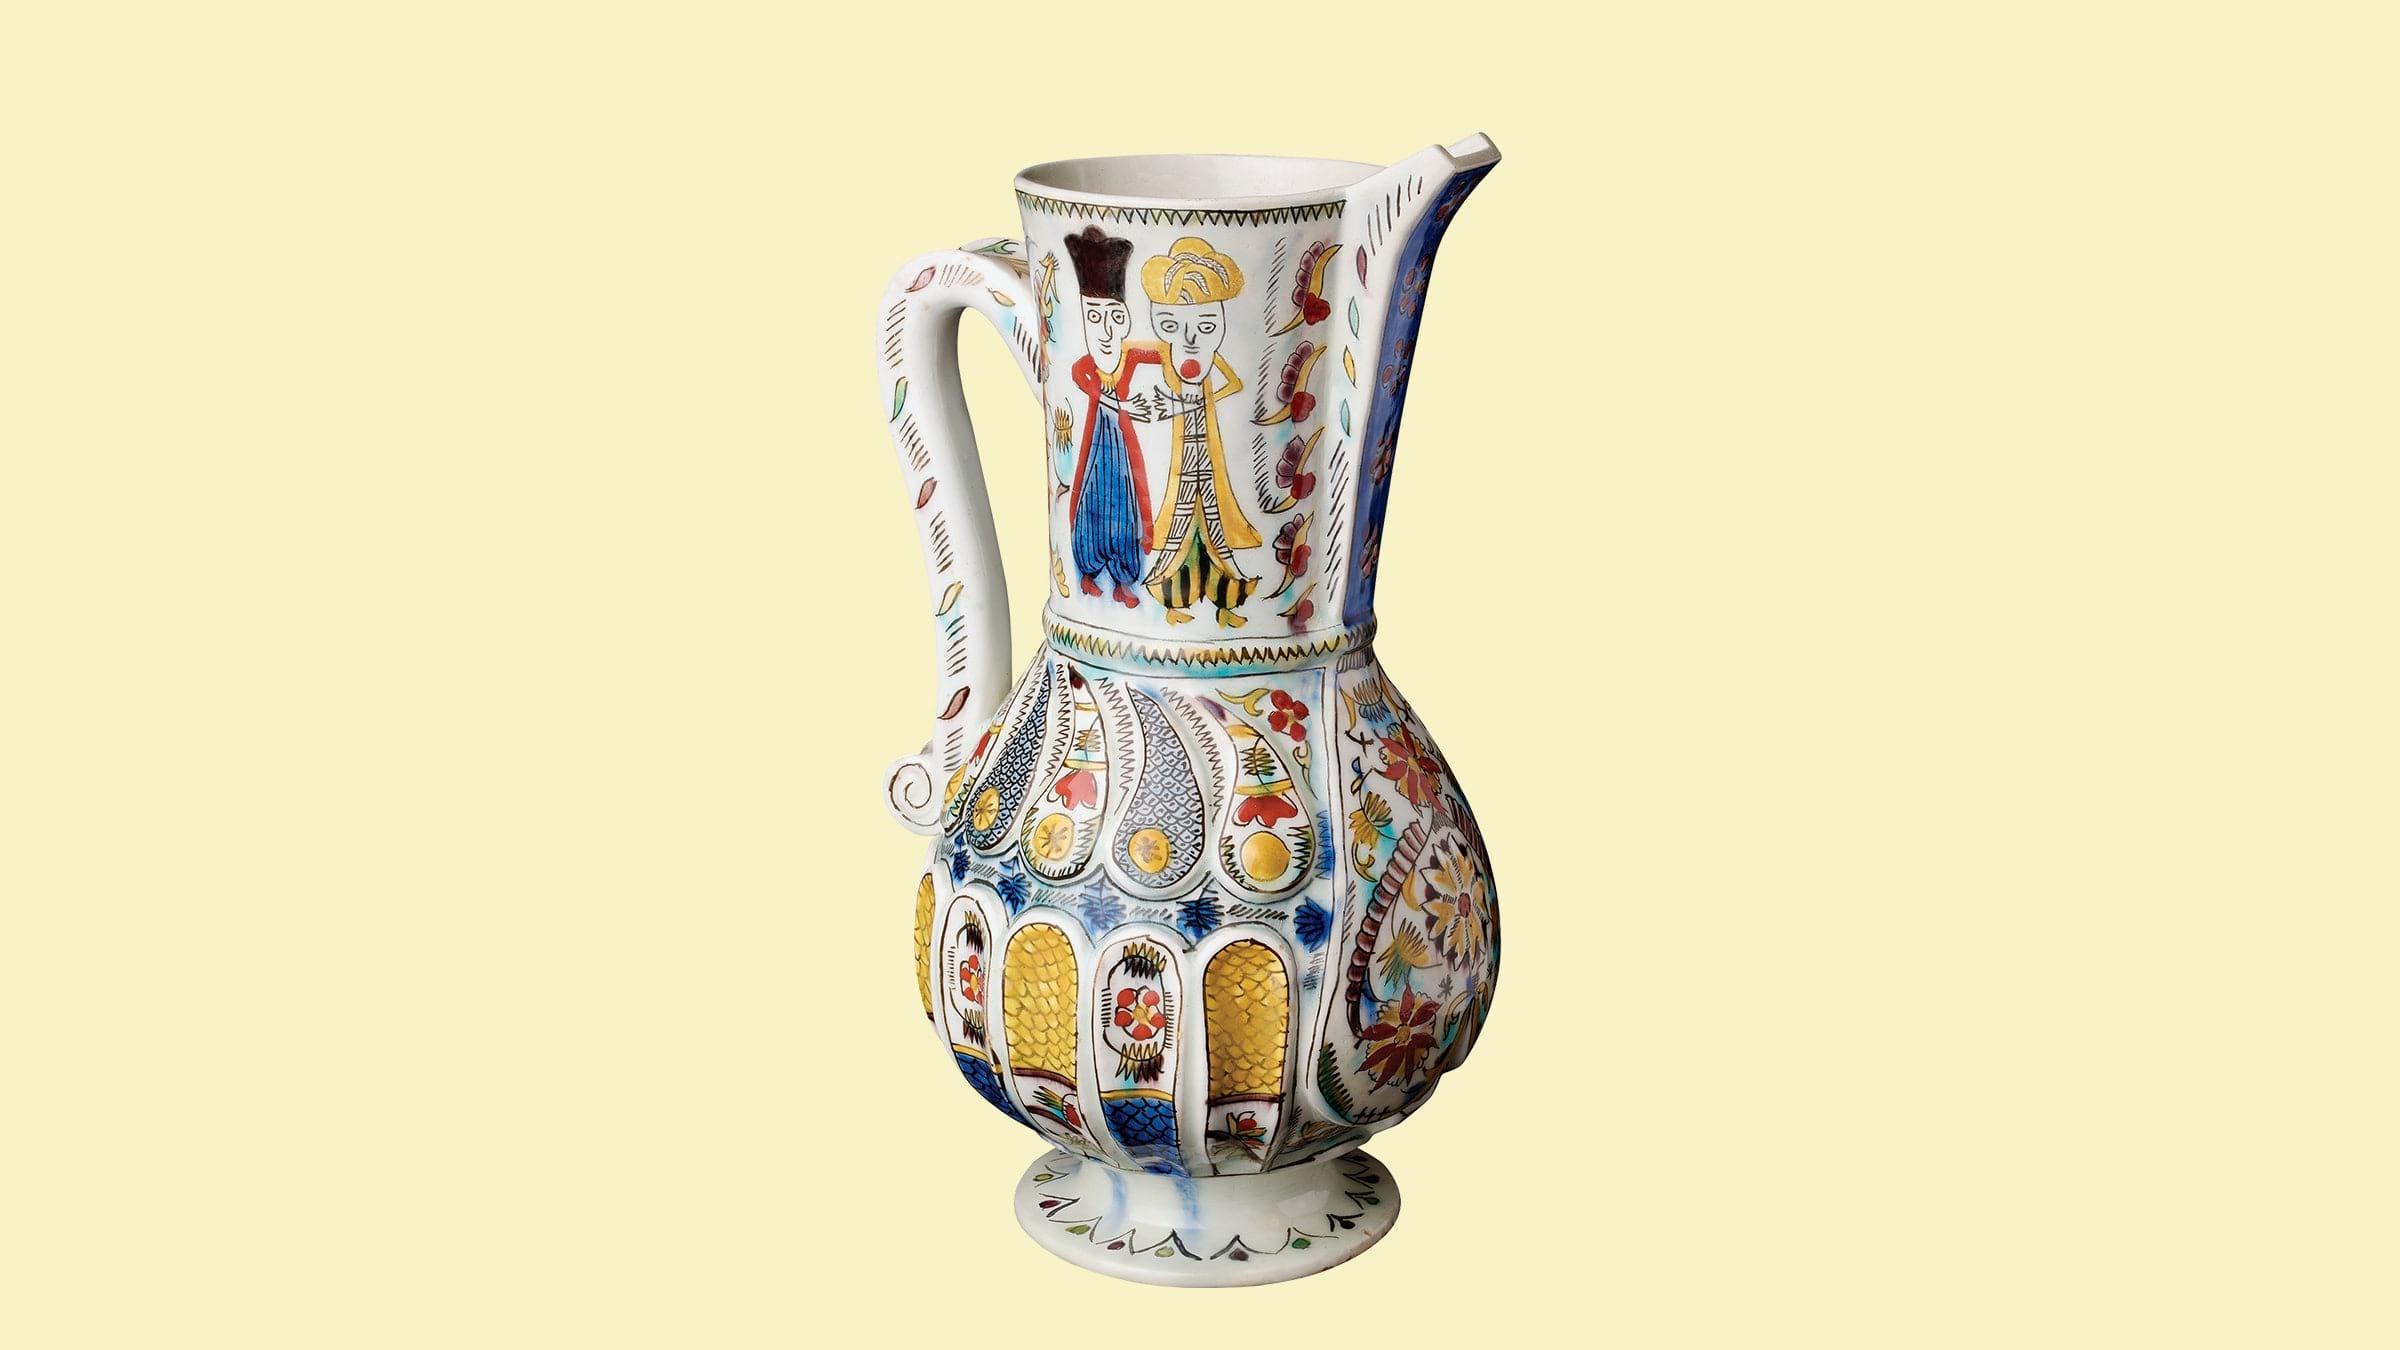 Kütahya Tiles and Ceramics Collection